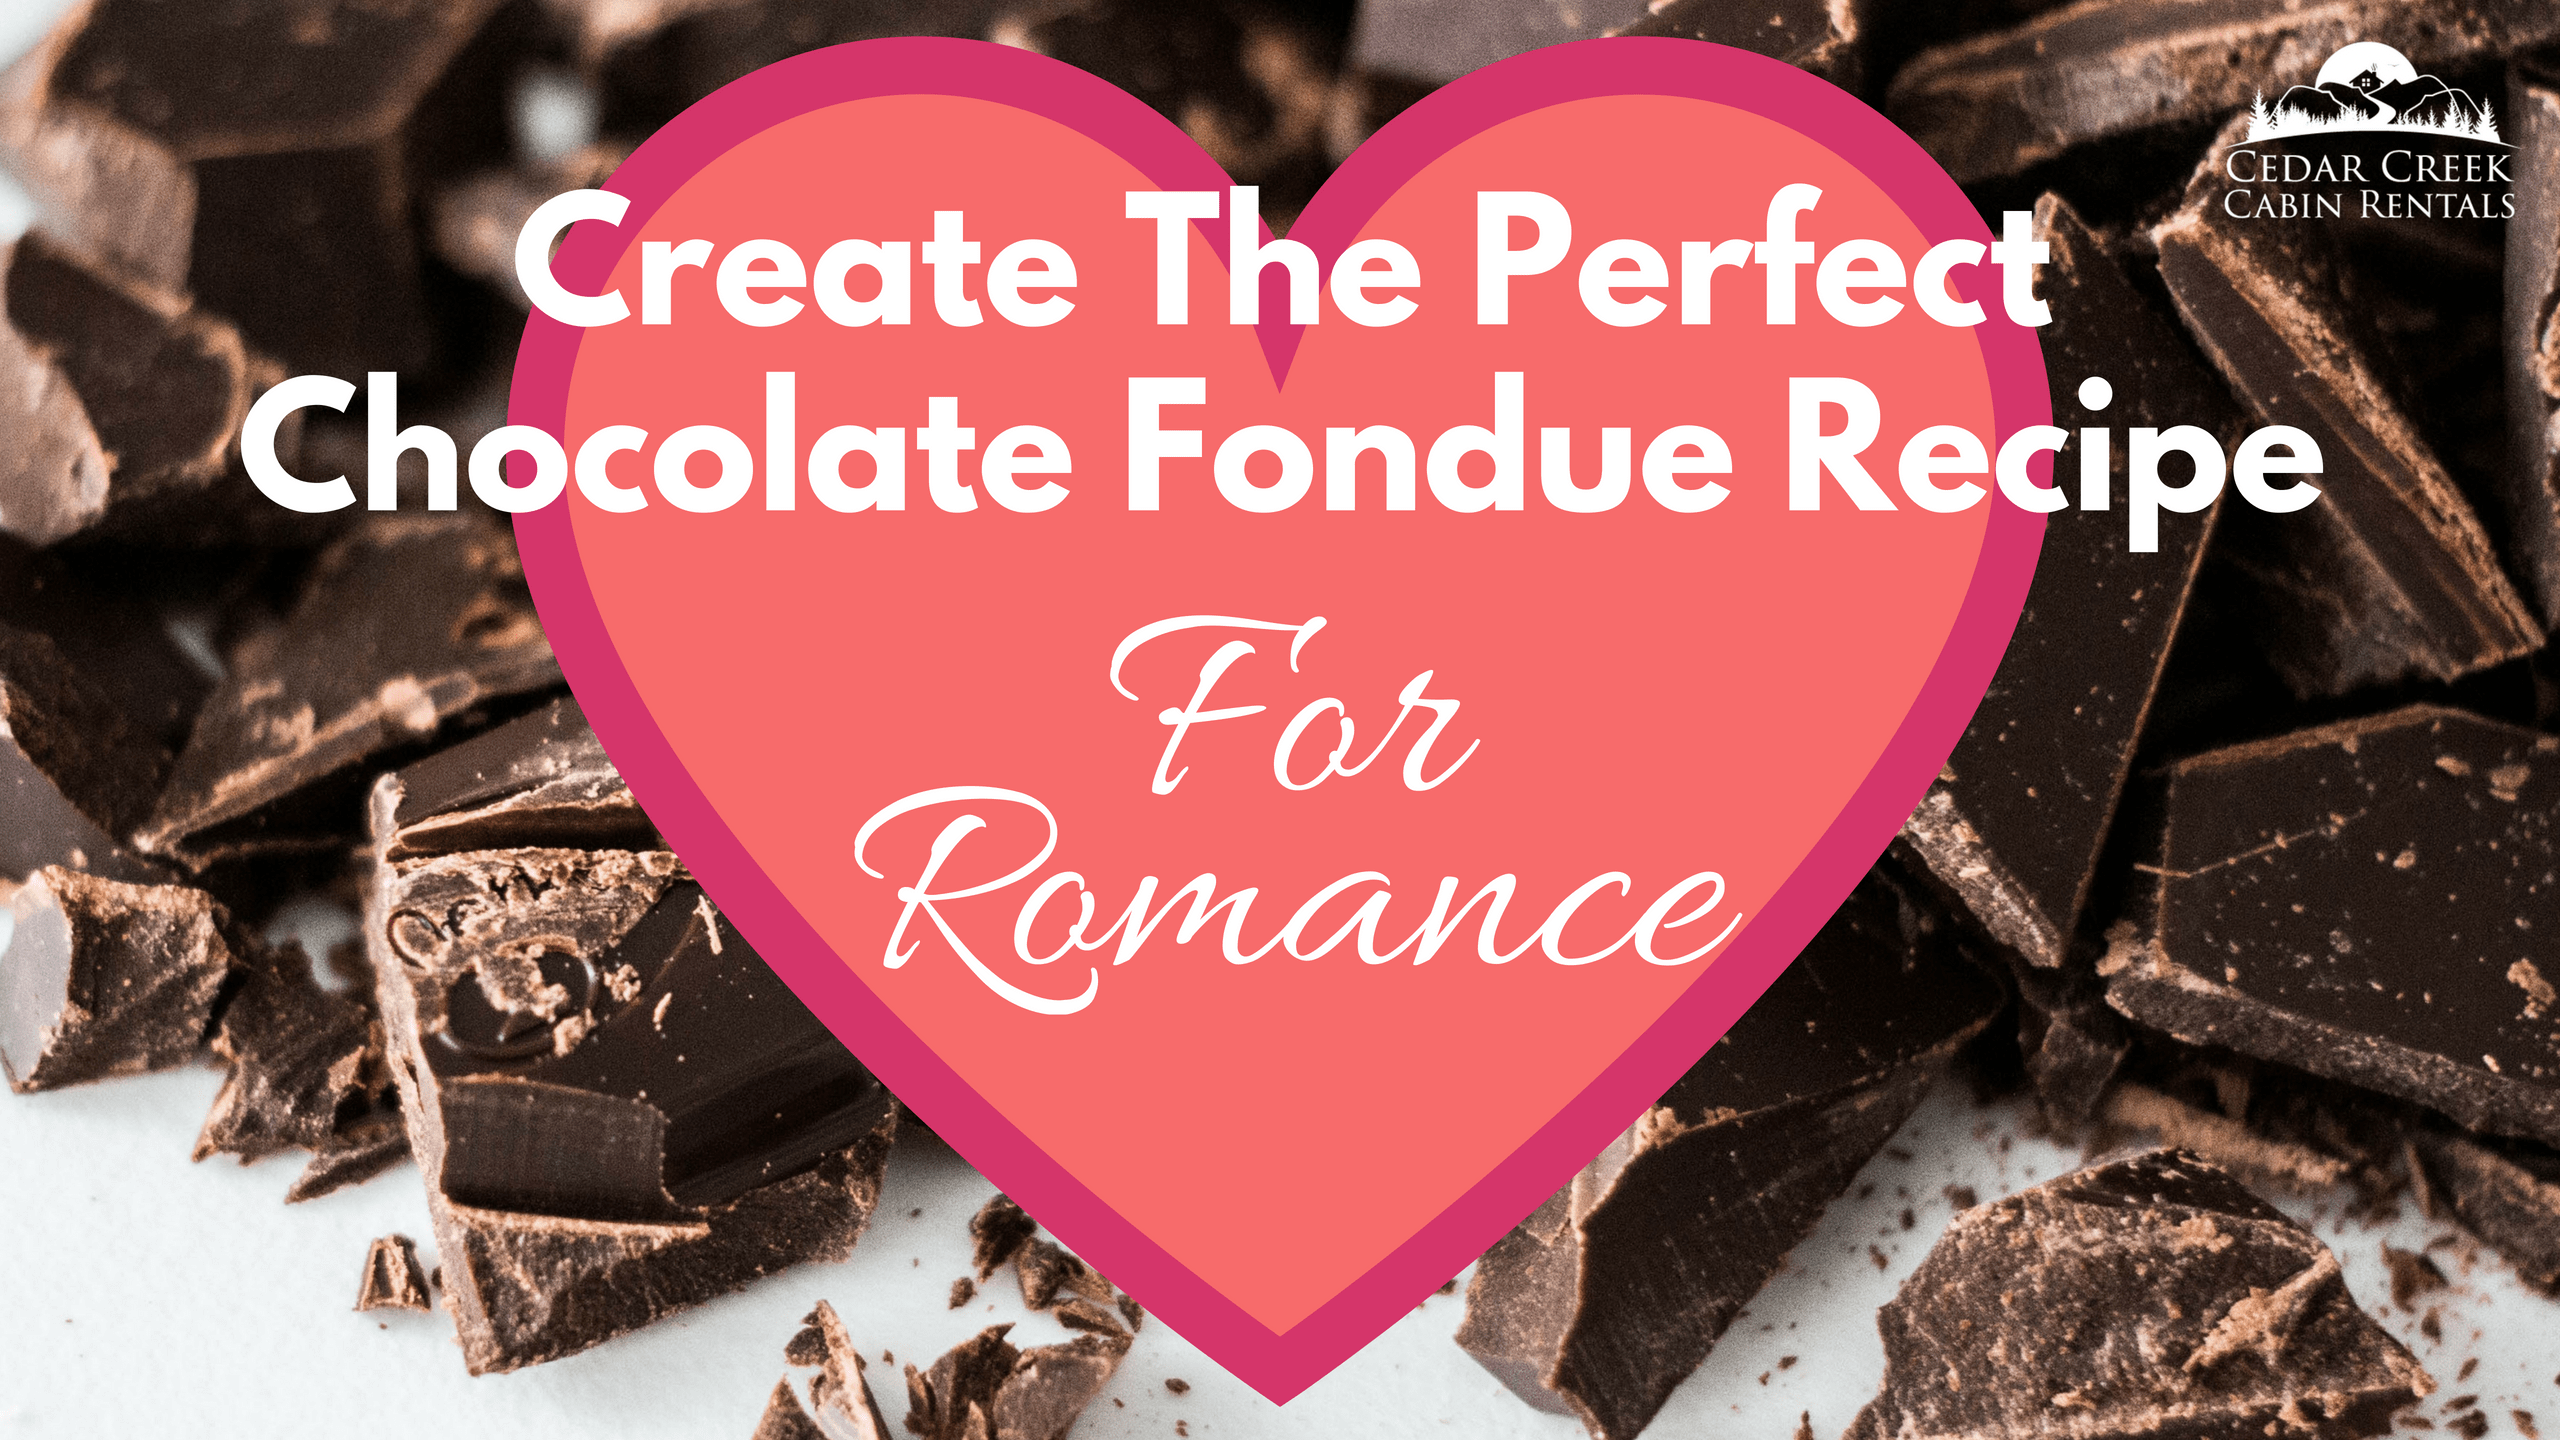 Create-The-Perfect-Chocolate-Fondue-Recipe-For-Romance-Blog-Banner